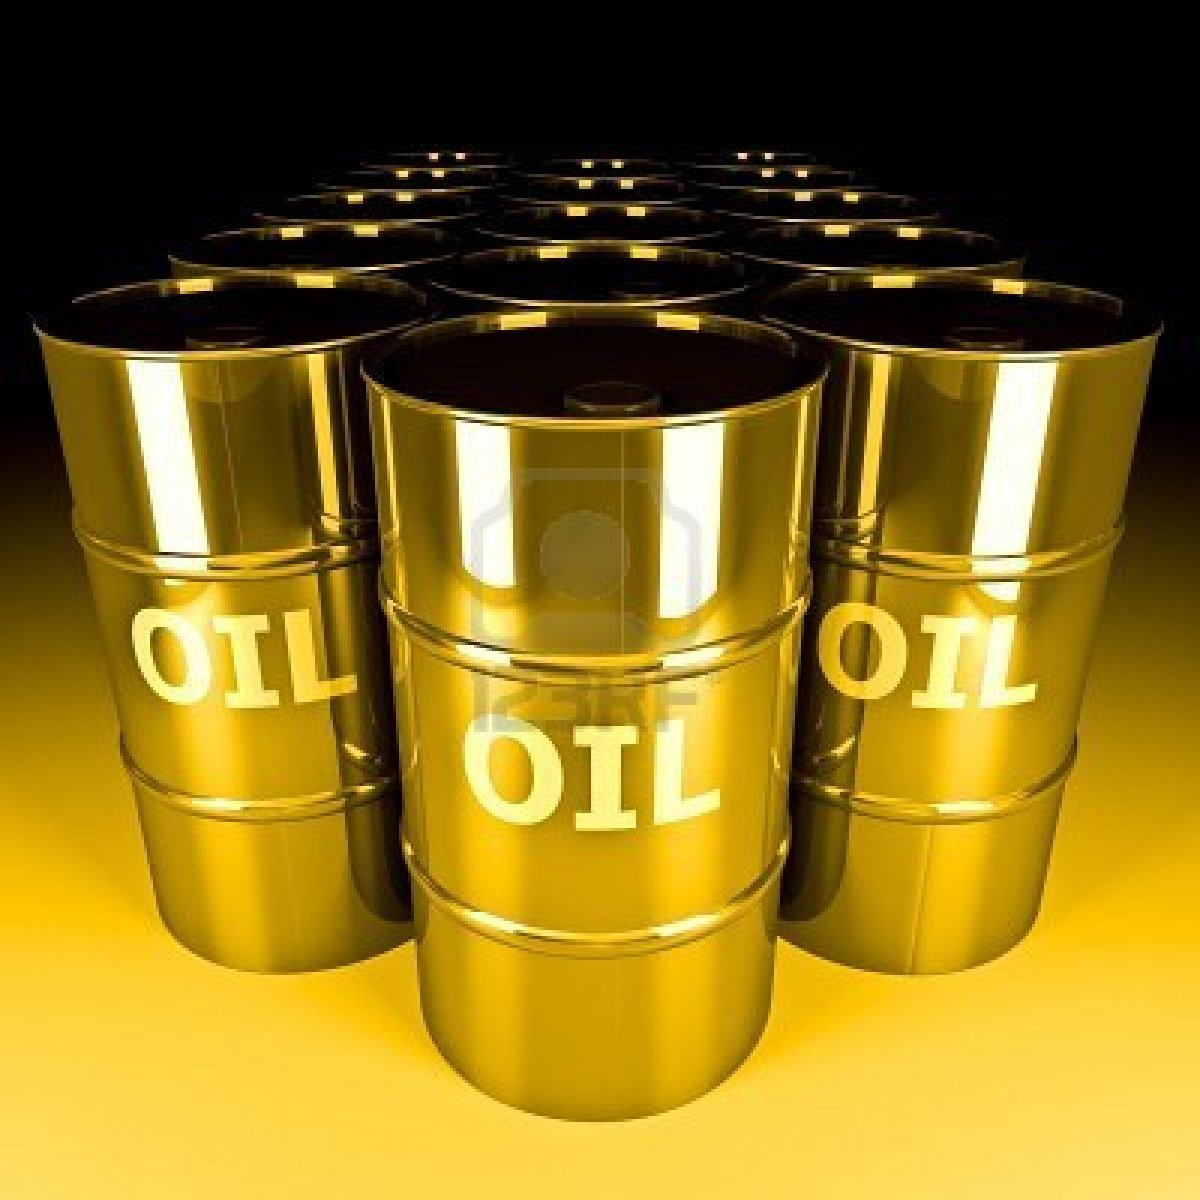 operazioni binarie oro petrolio we point per opzioni binarie download